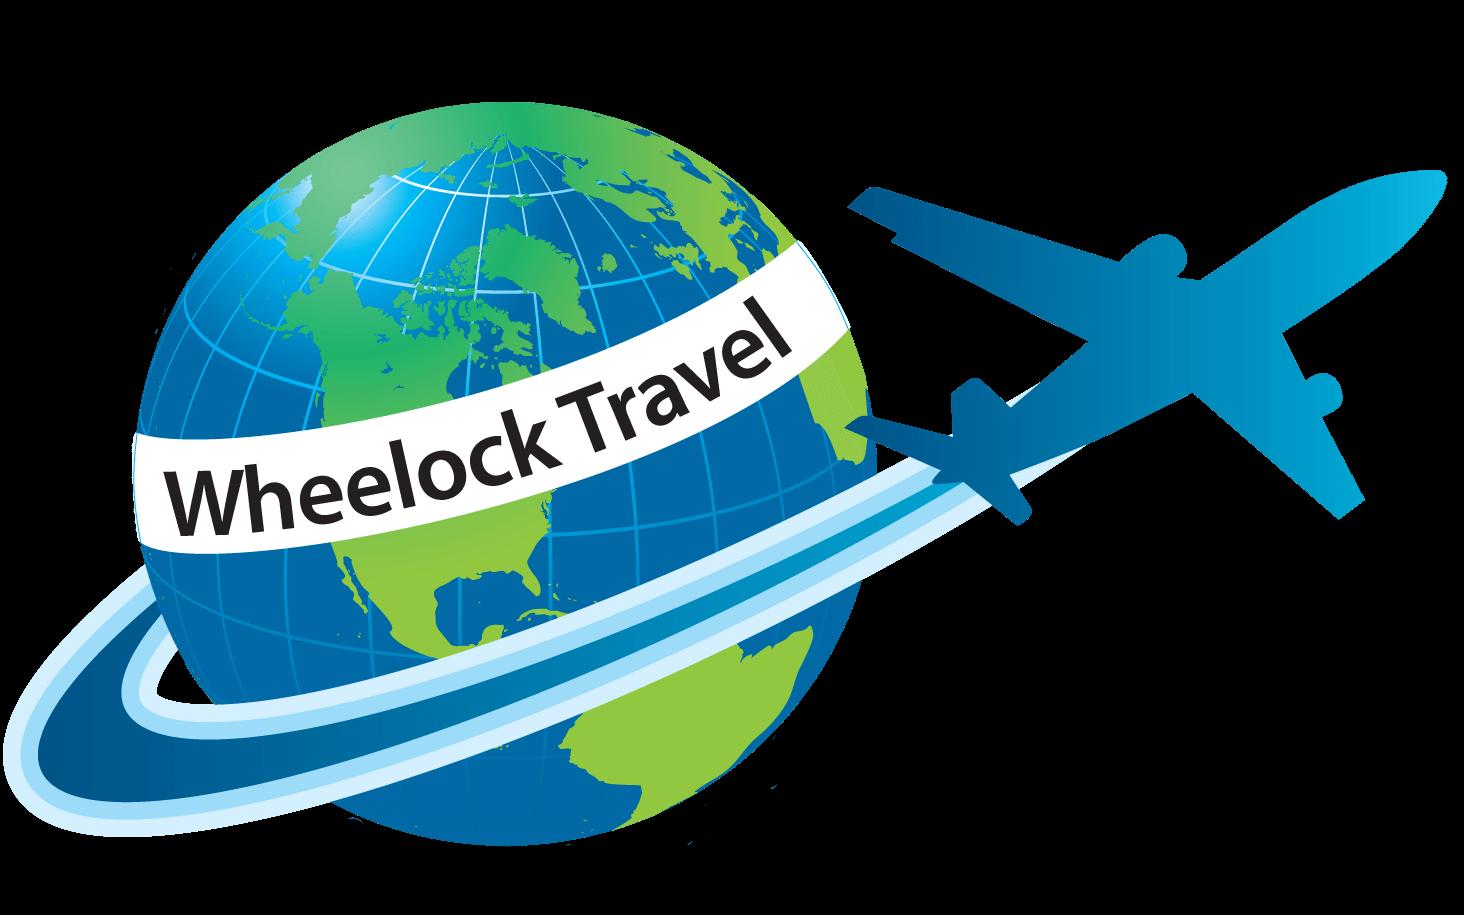 1464x915 Nh Travel Agent Wheelock Travel